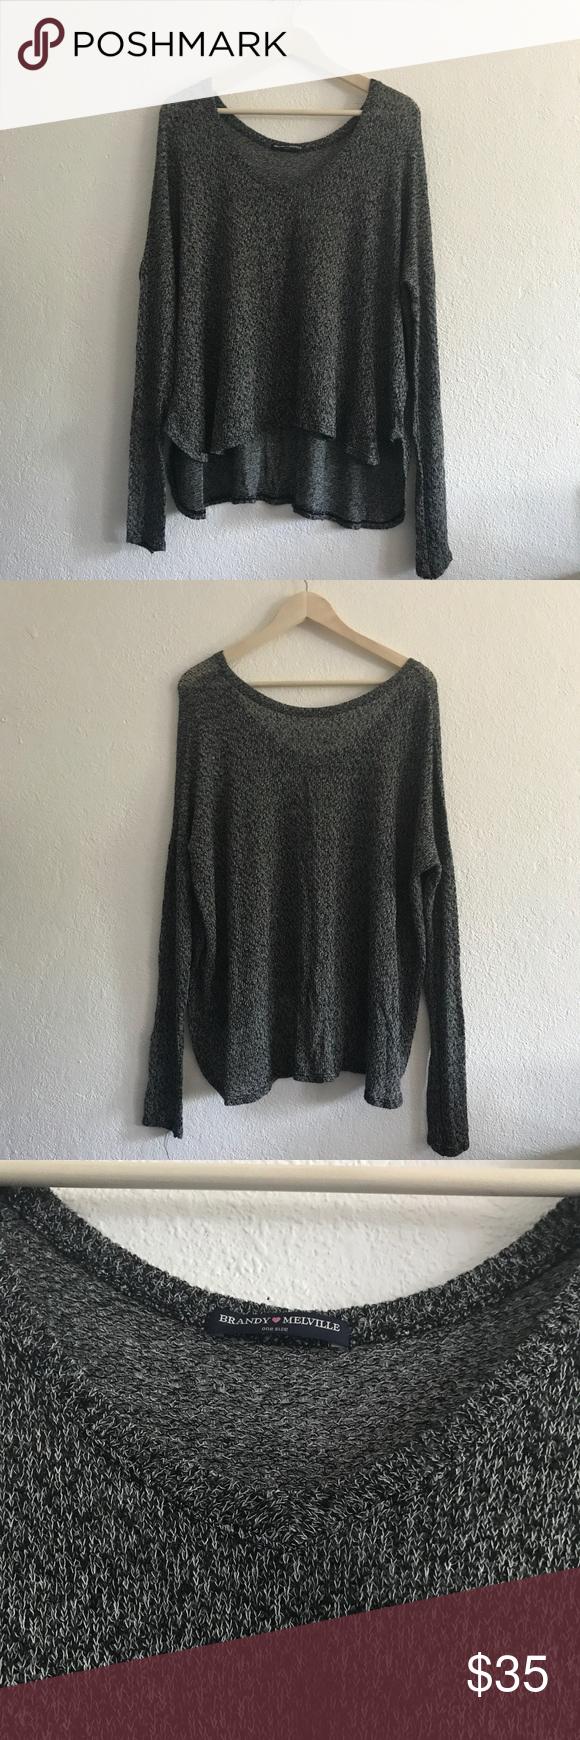 Brandy Melville dark grey sheer oversized sweater | Brandy ...